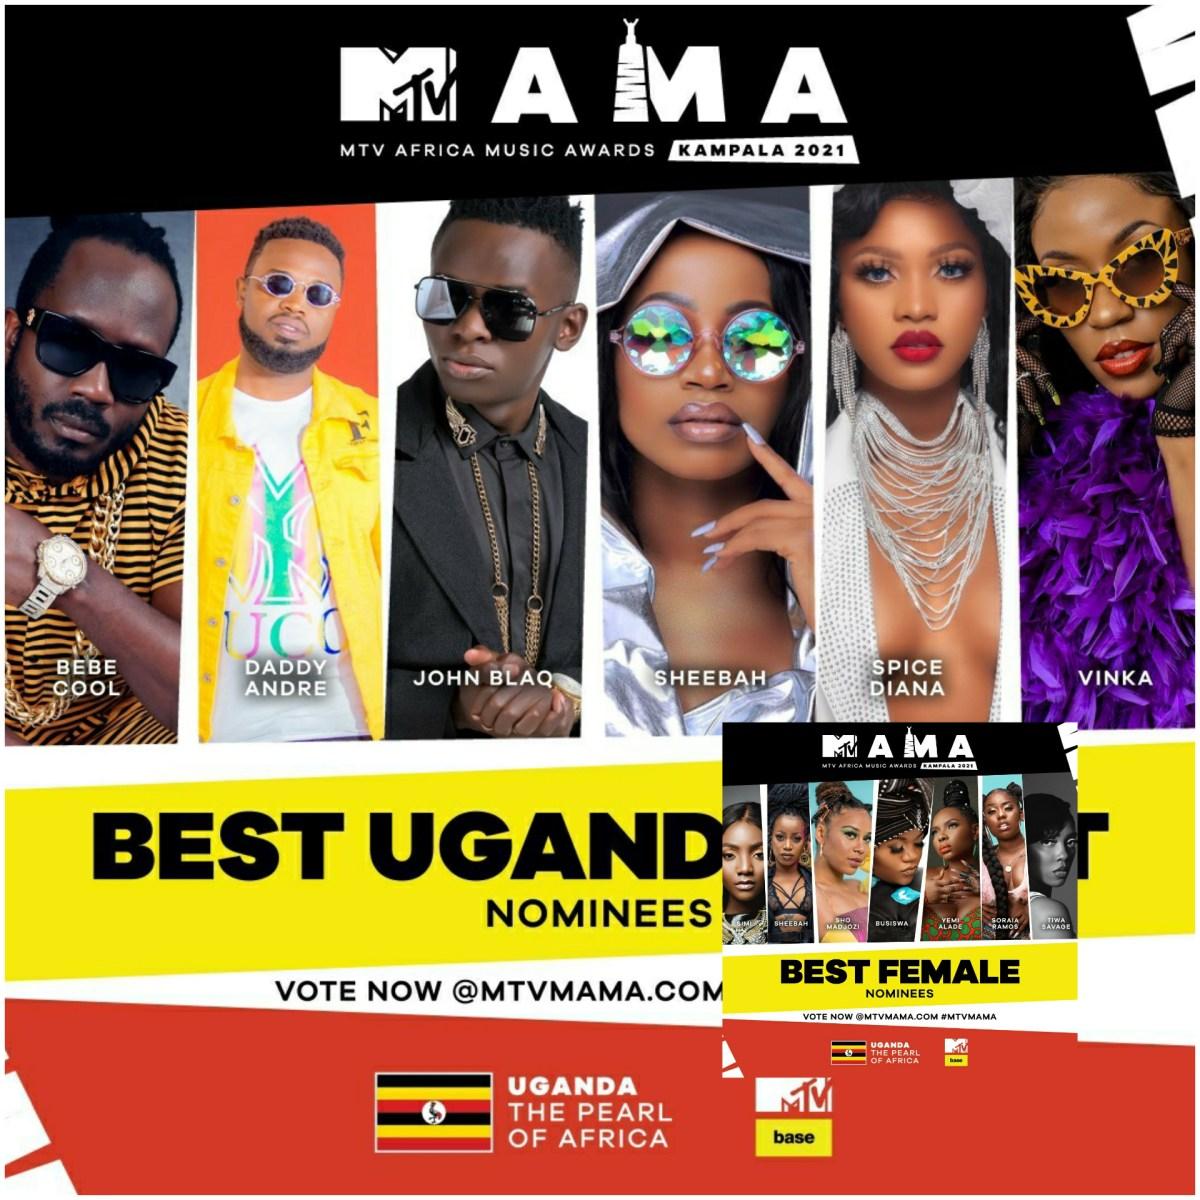 MTV Africa Music Awards 2021: Full nominations list